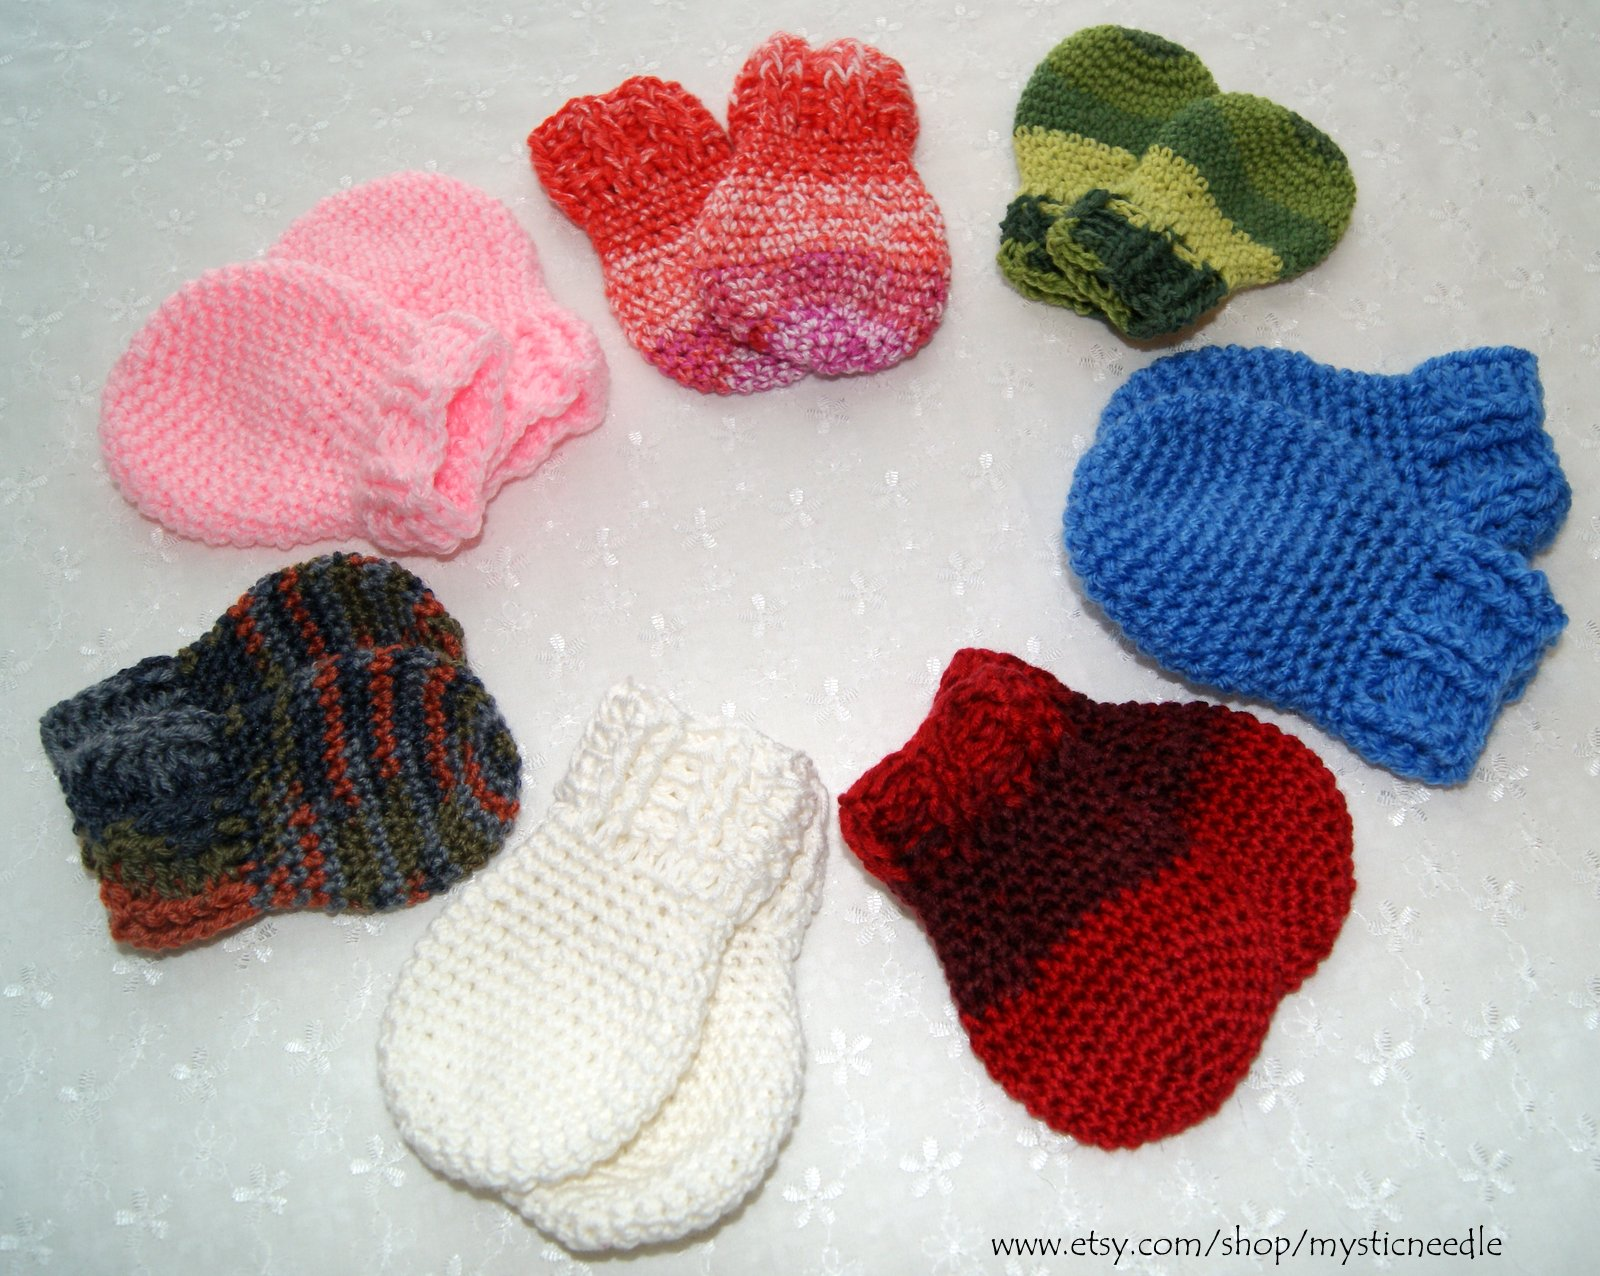 Crochet Thumbless Mittens | Stitch4eveR